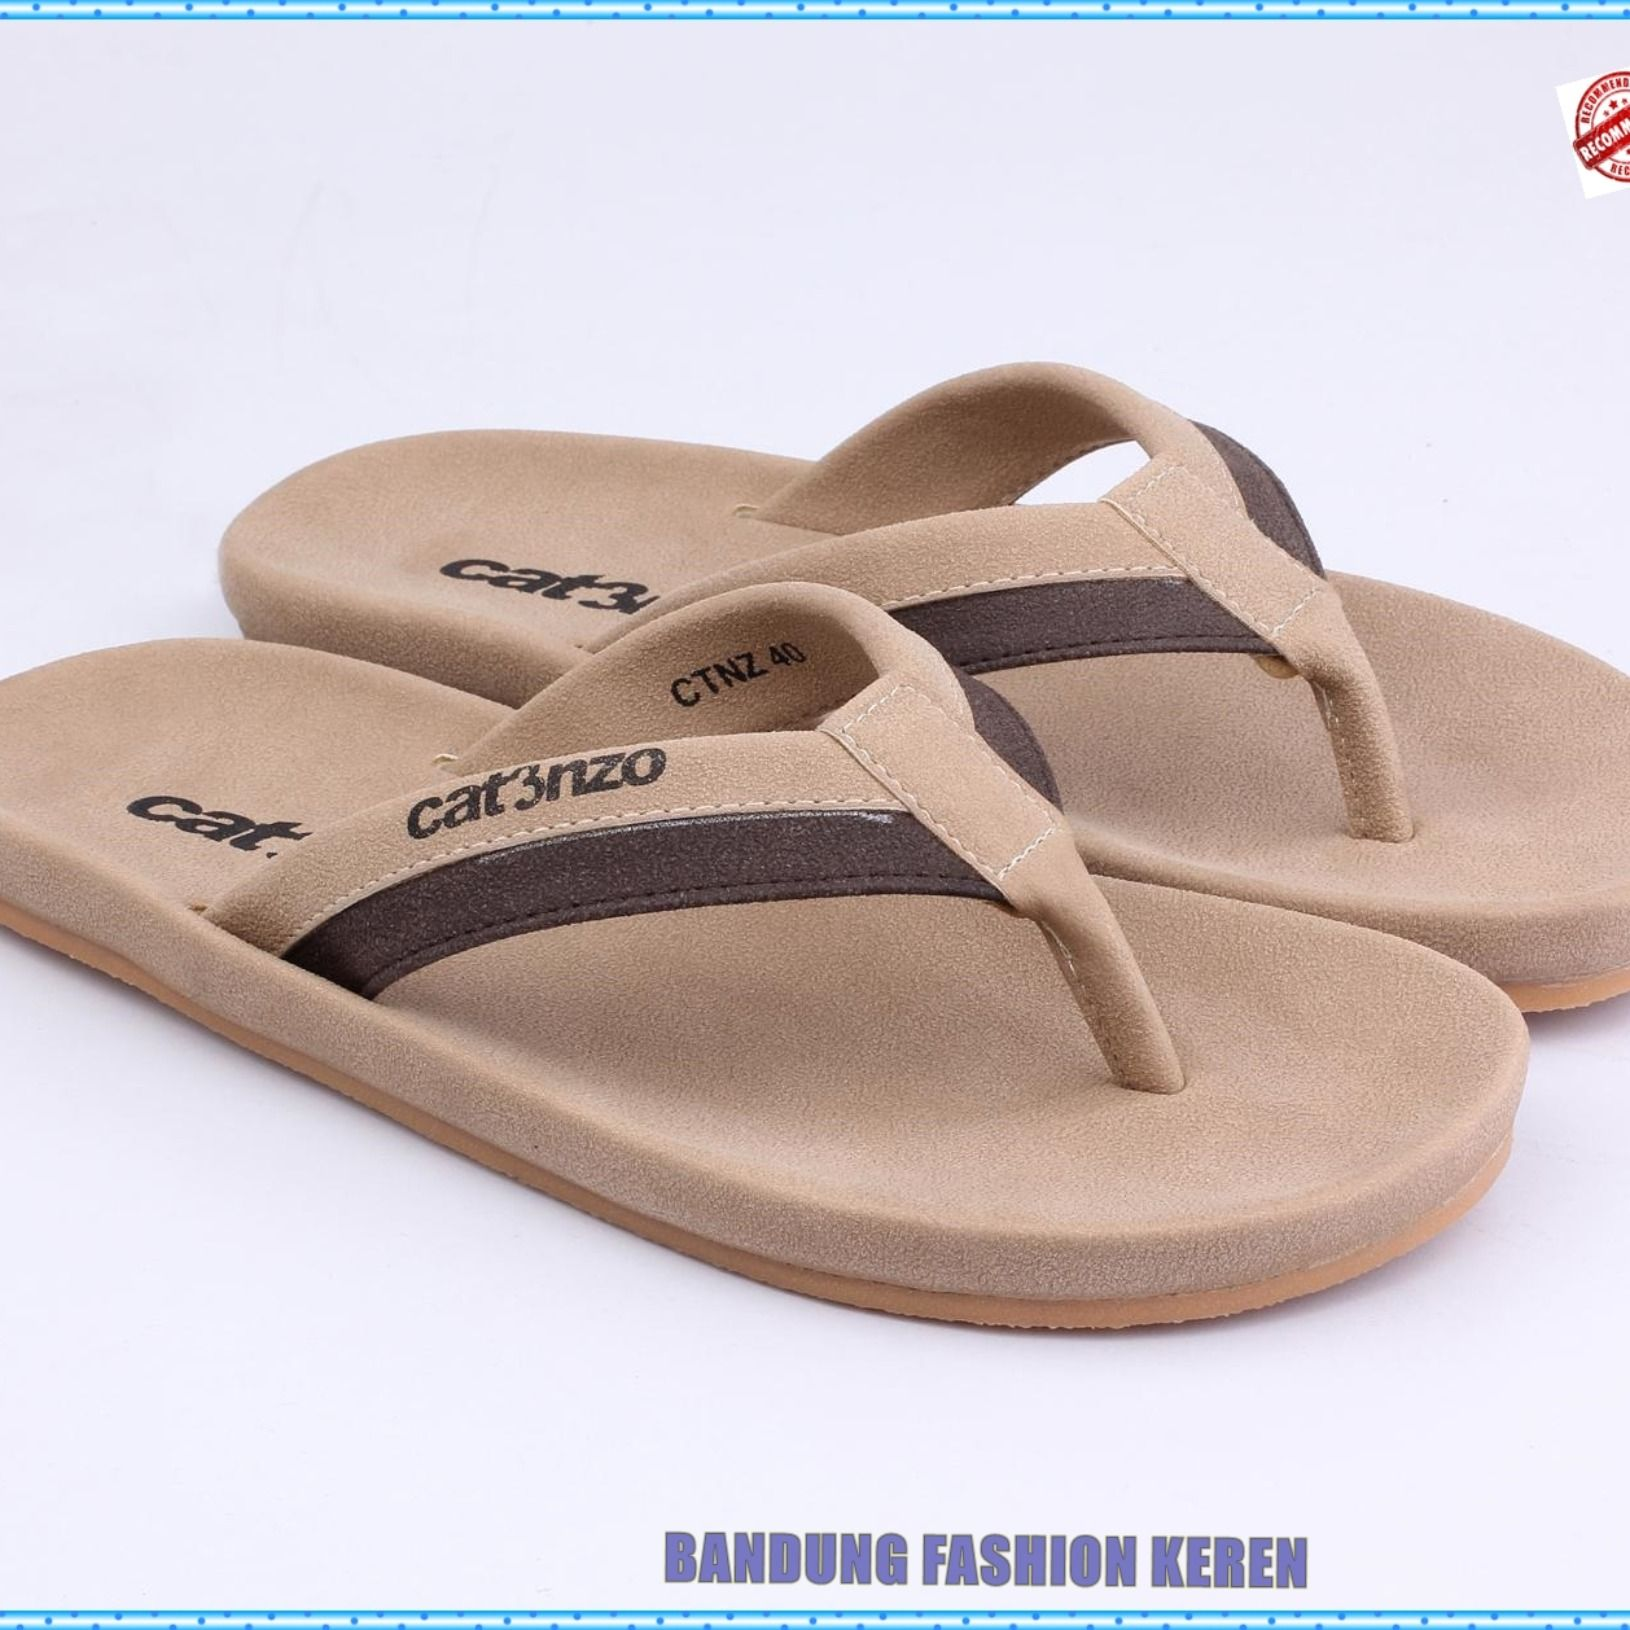 Sandal Casual Pria No 091 Produk Fashion Handmade Terbaik 100